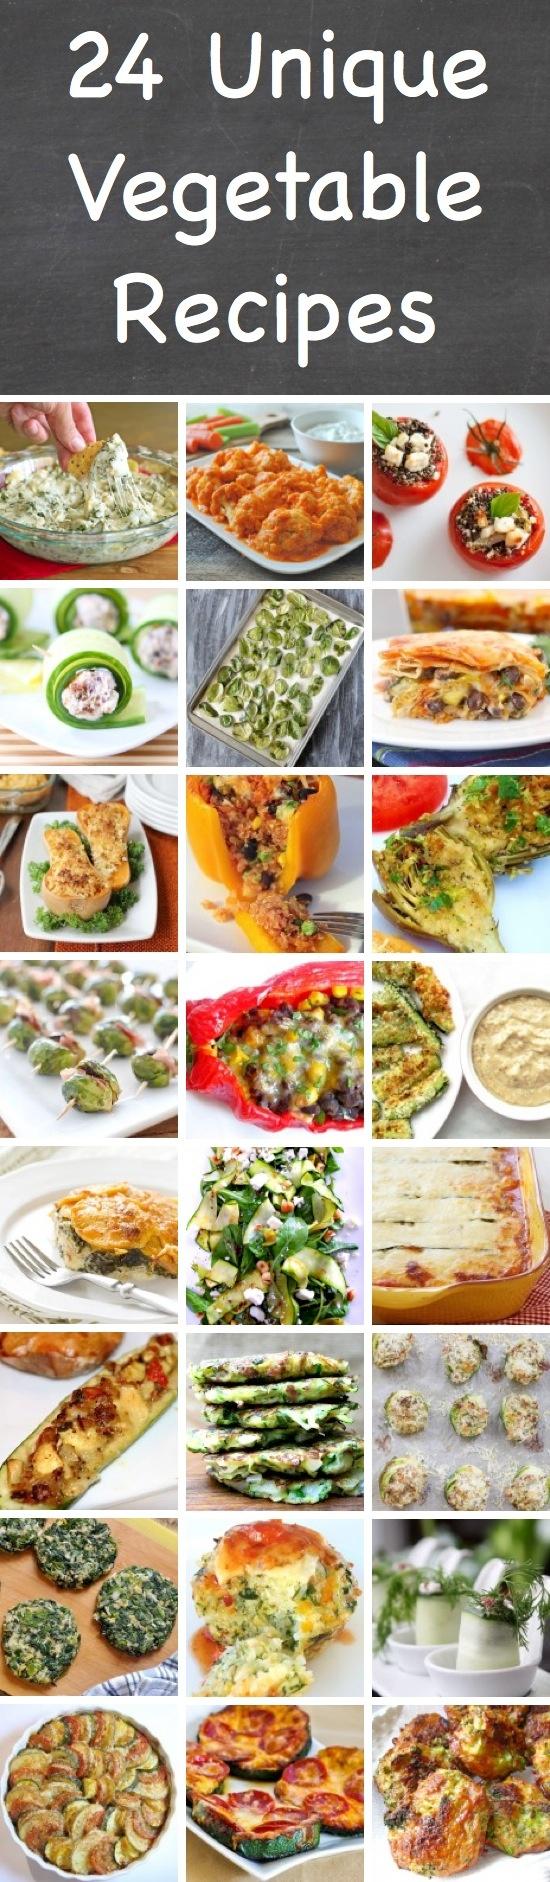 24 Unique Vegetable Recipes   Recipe By Photo